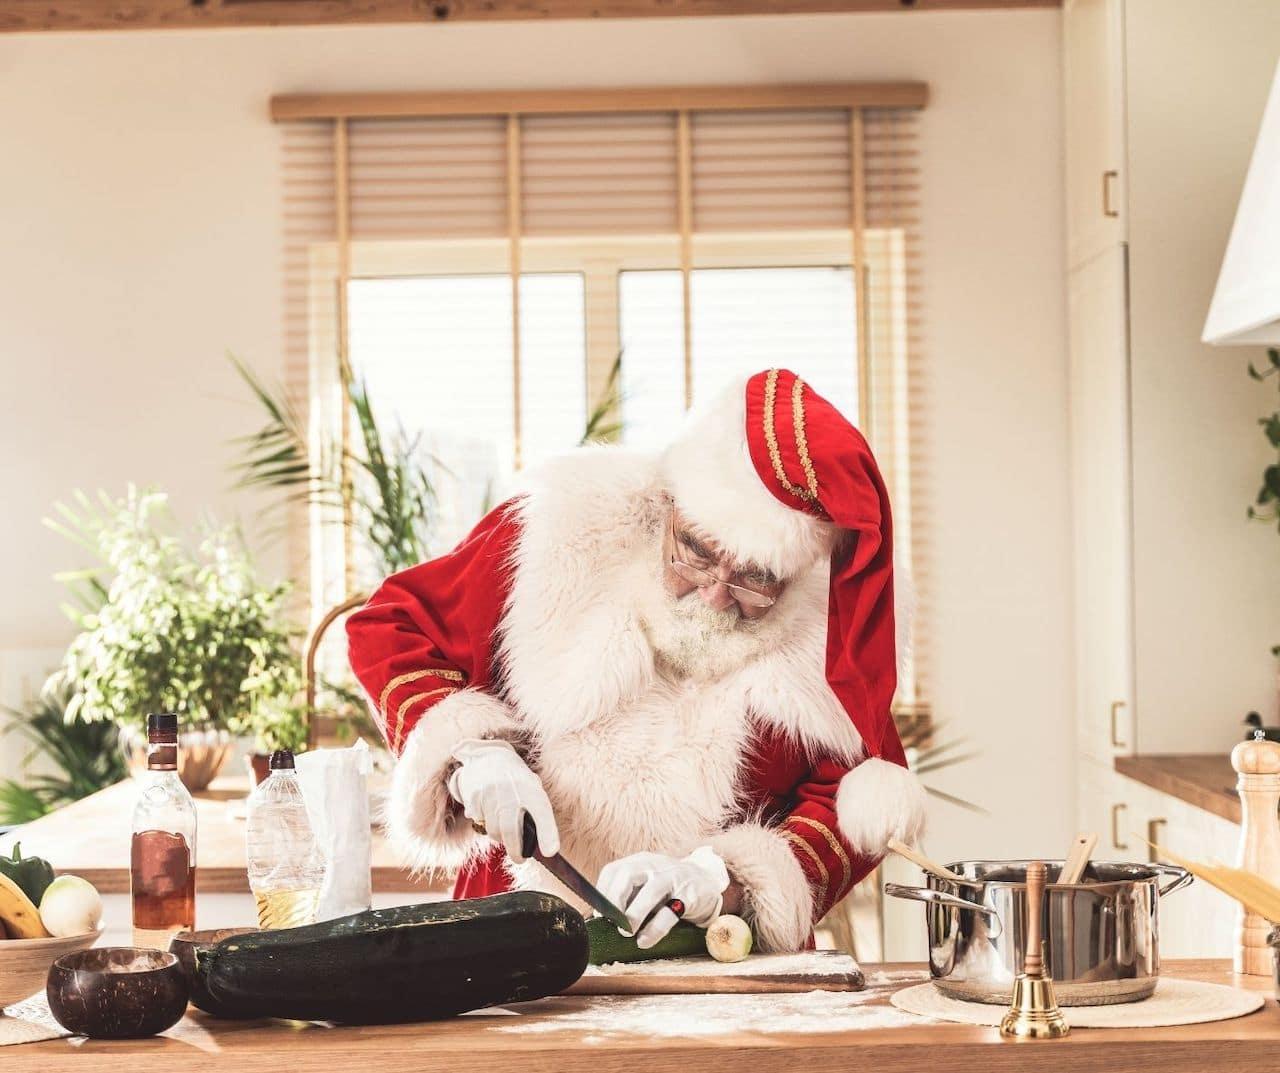 santa christmas cooking